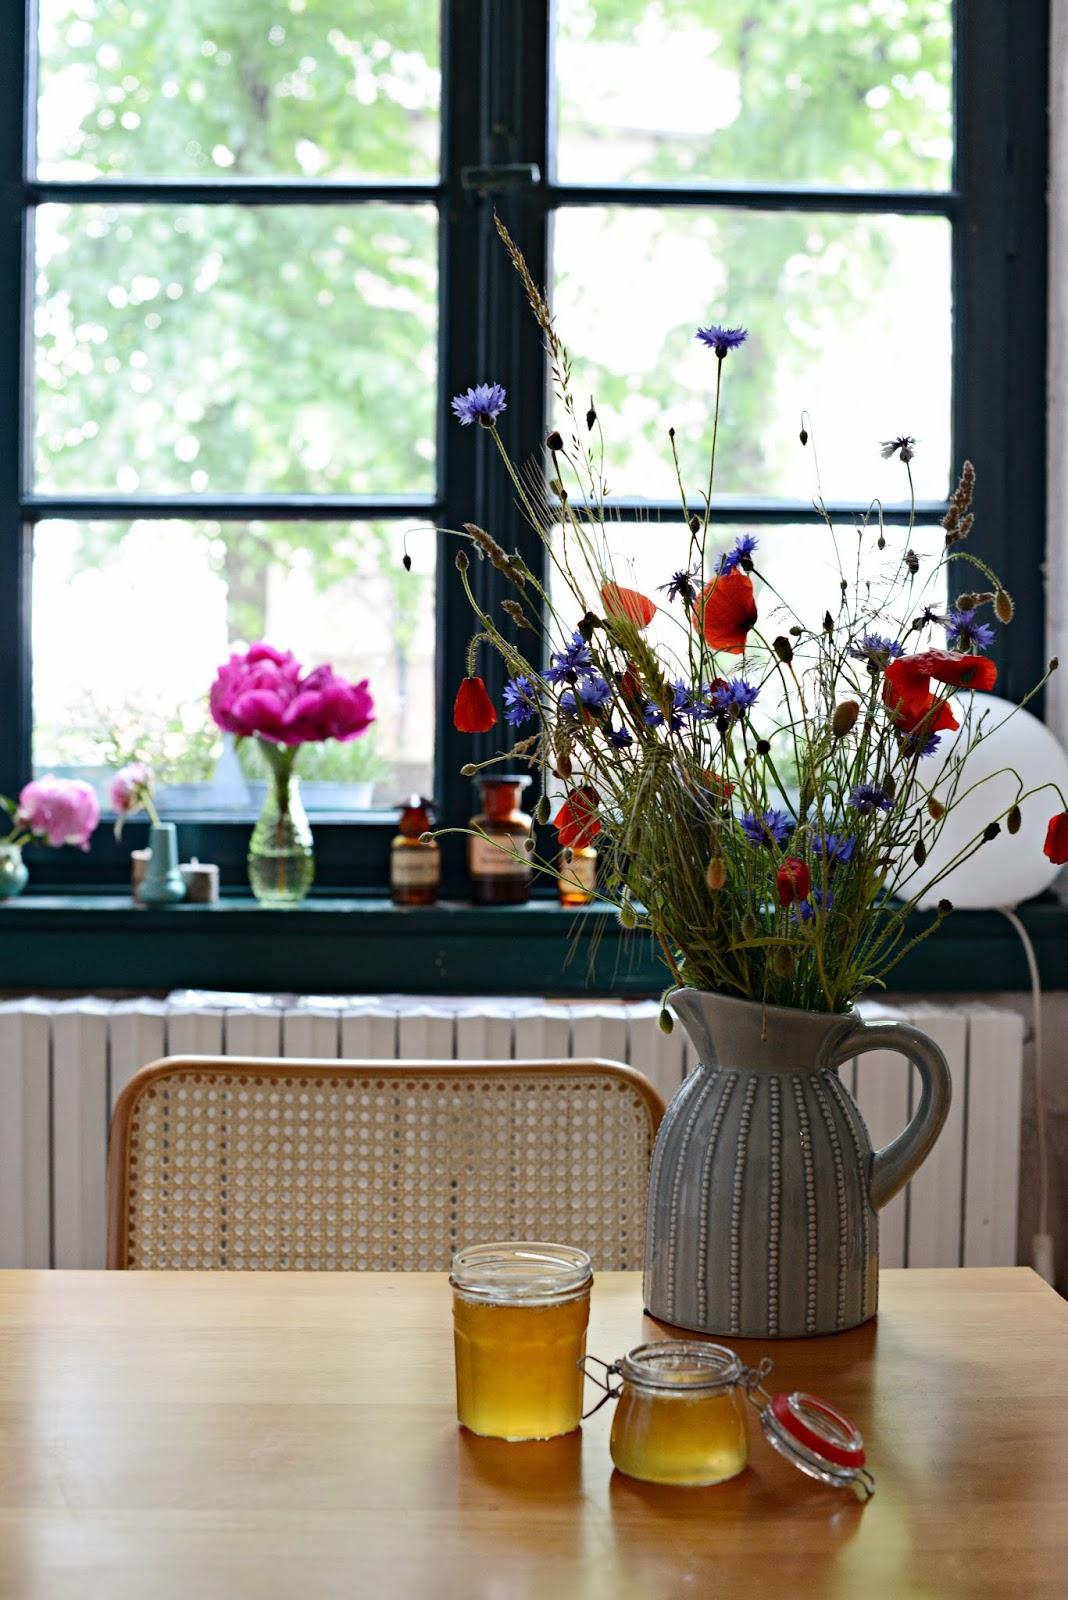 wie ich mir den sommer ins haus holte rezept f r holunderbl tengelee marmeladekisses. Black Bedroom Furniture Sets. Home Design Ideas